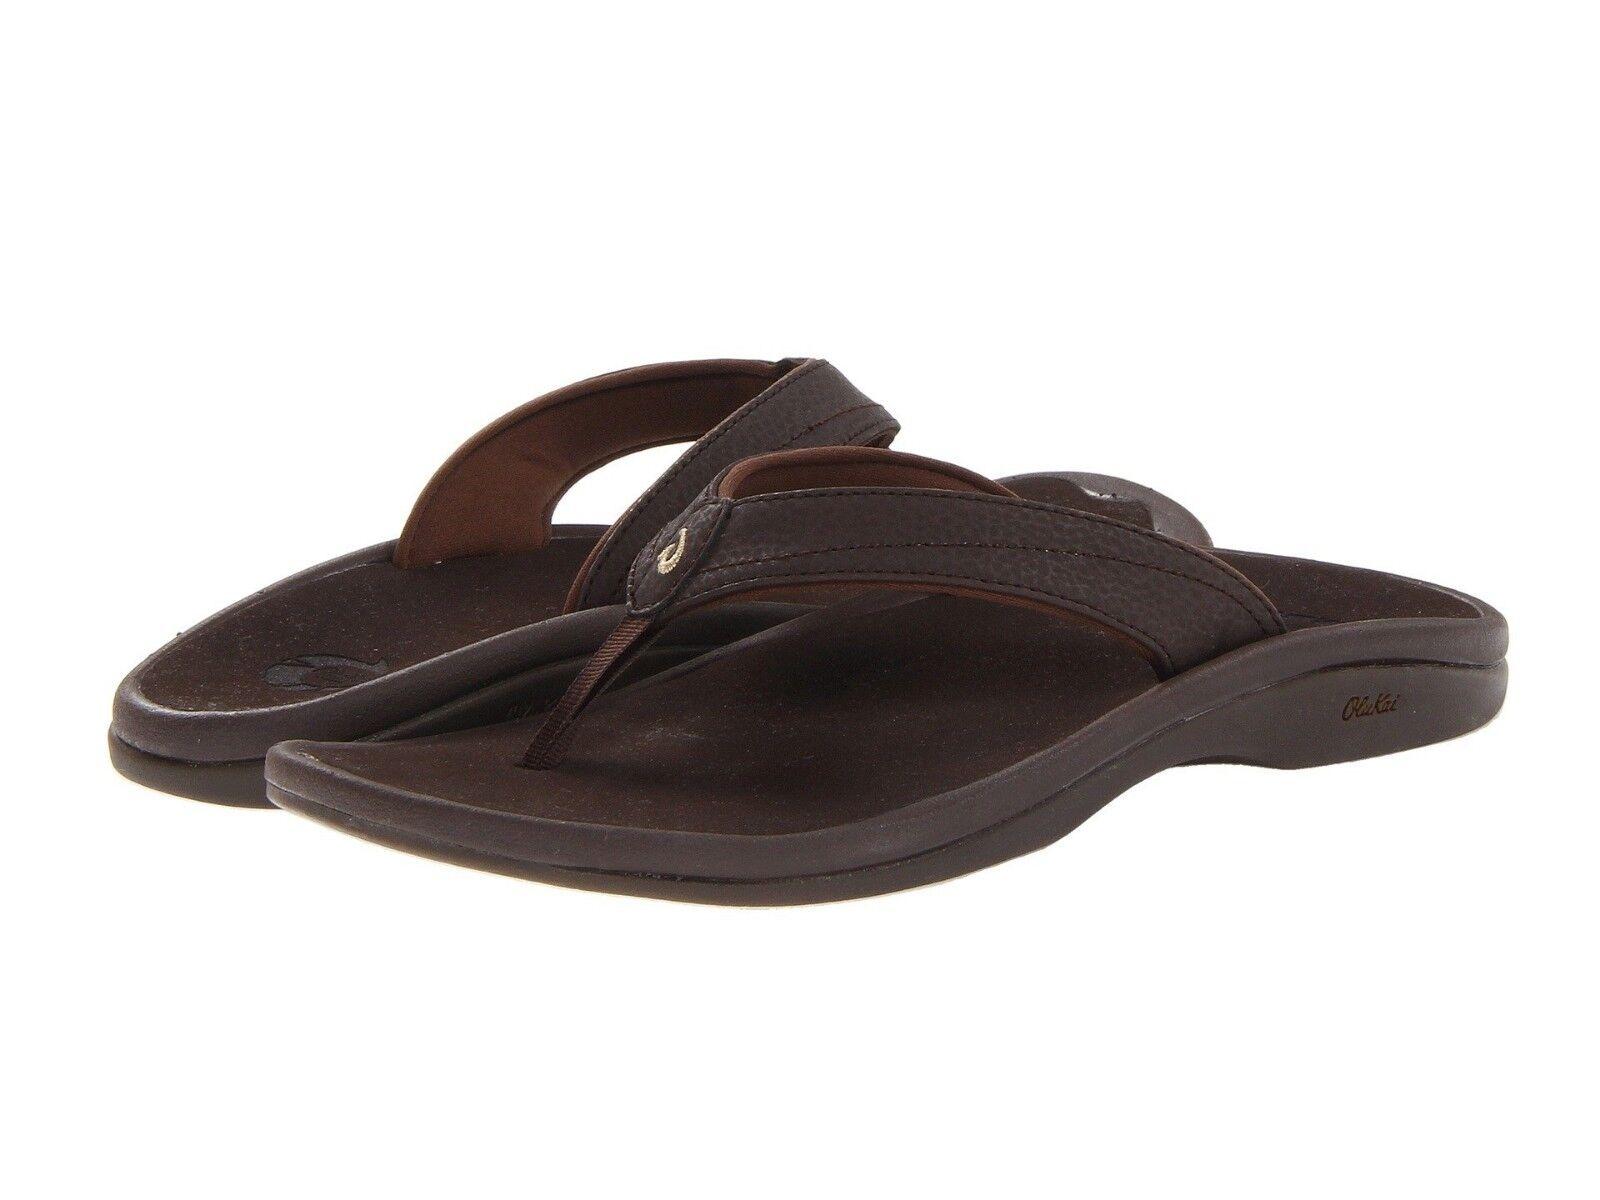 Women's shoes OluKai Ohana Casual Thong Sandals 20110-4848 Dark Java New